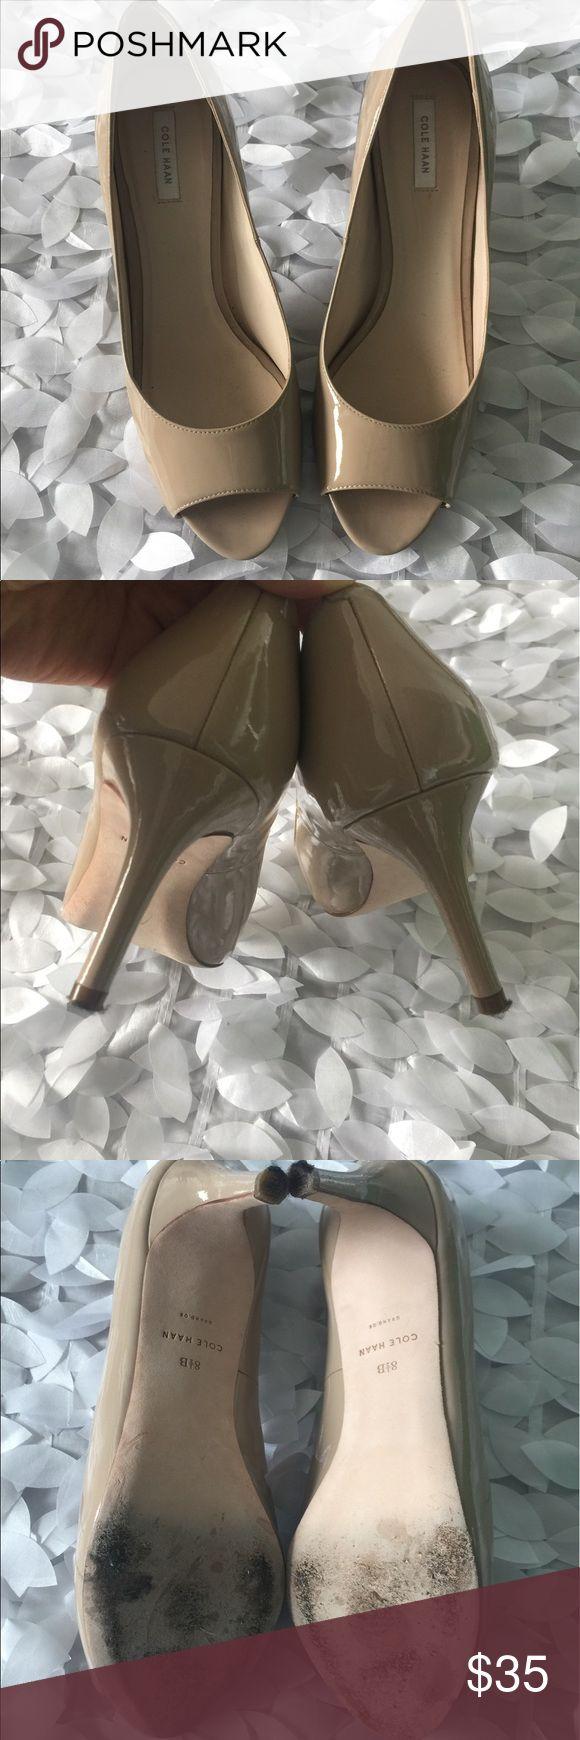 Cole Hann Patent Peep Toe Heel 8.5 Great condition Pre-owned Cole Hann peep toe 8.5 Cole Haan Shoes Heels